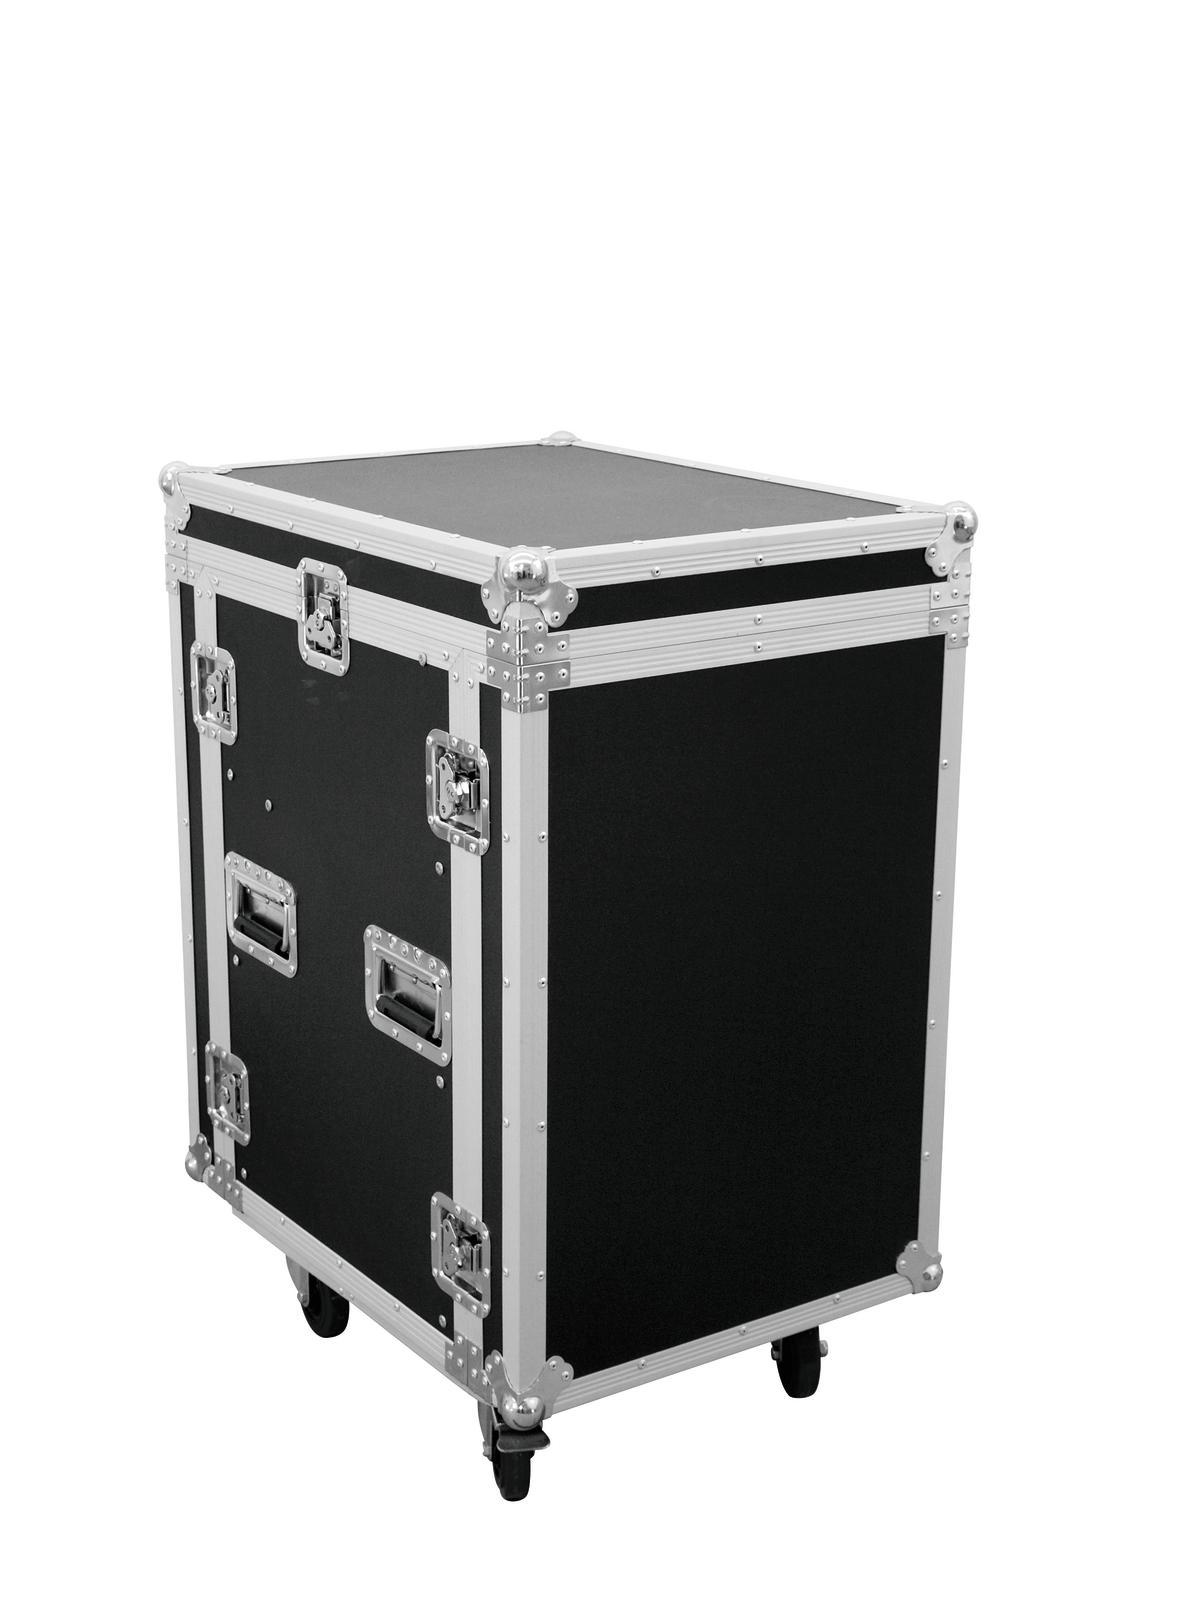 ROADINGER Spezial-Kombi-Case U 14HE